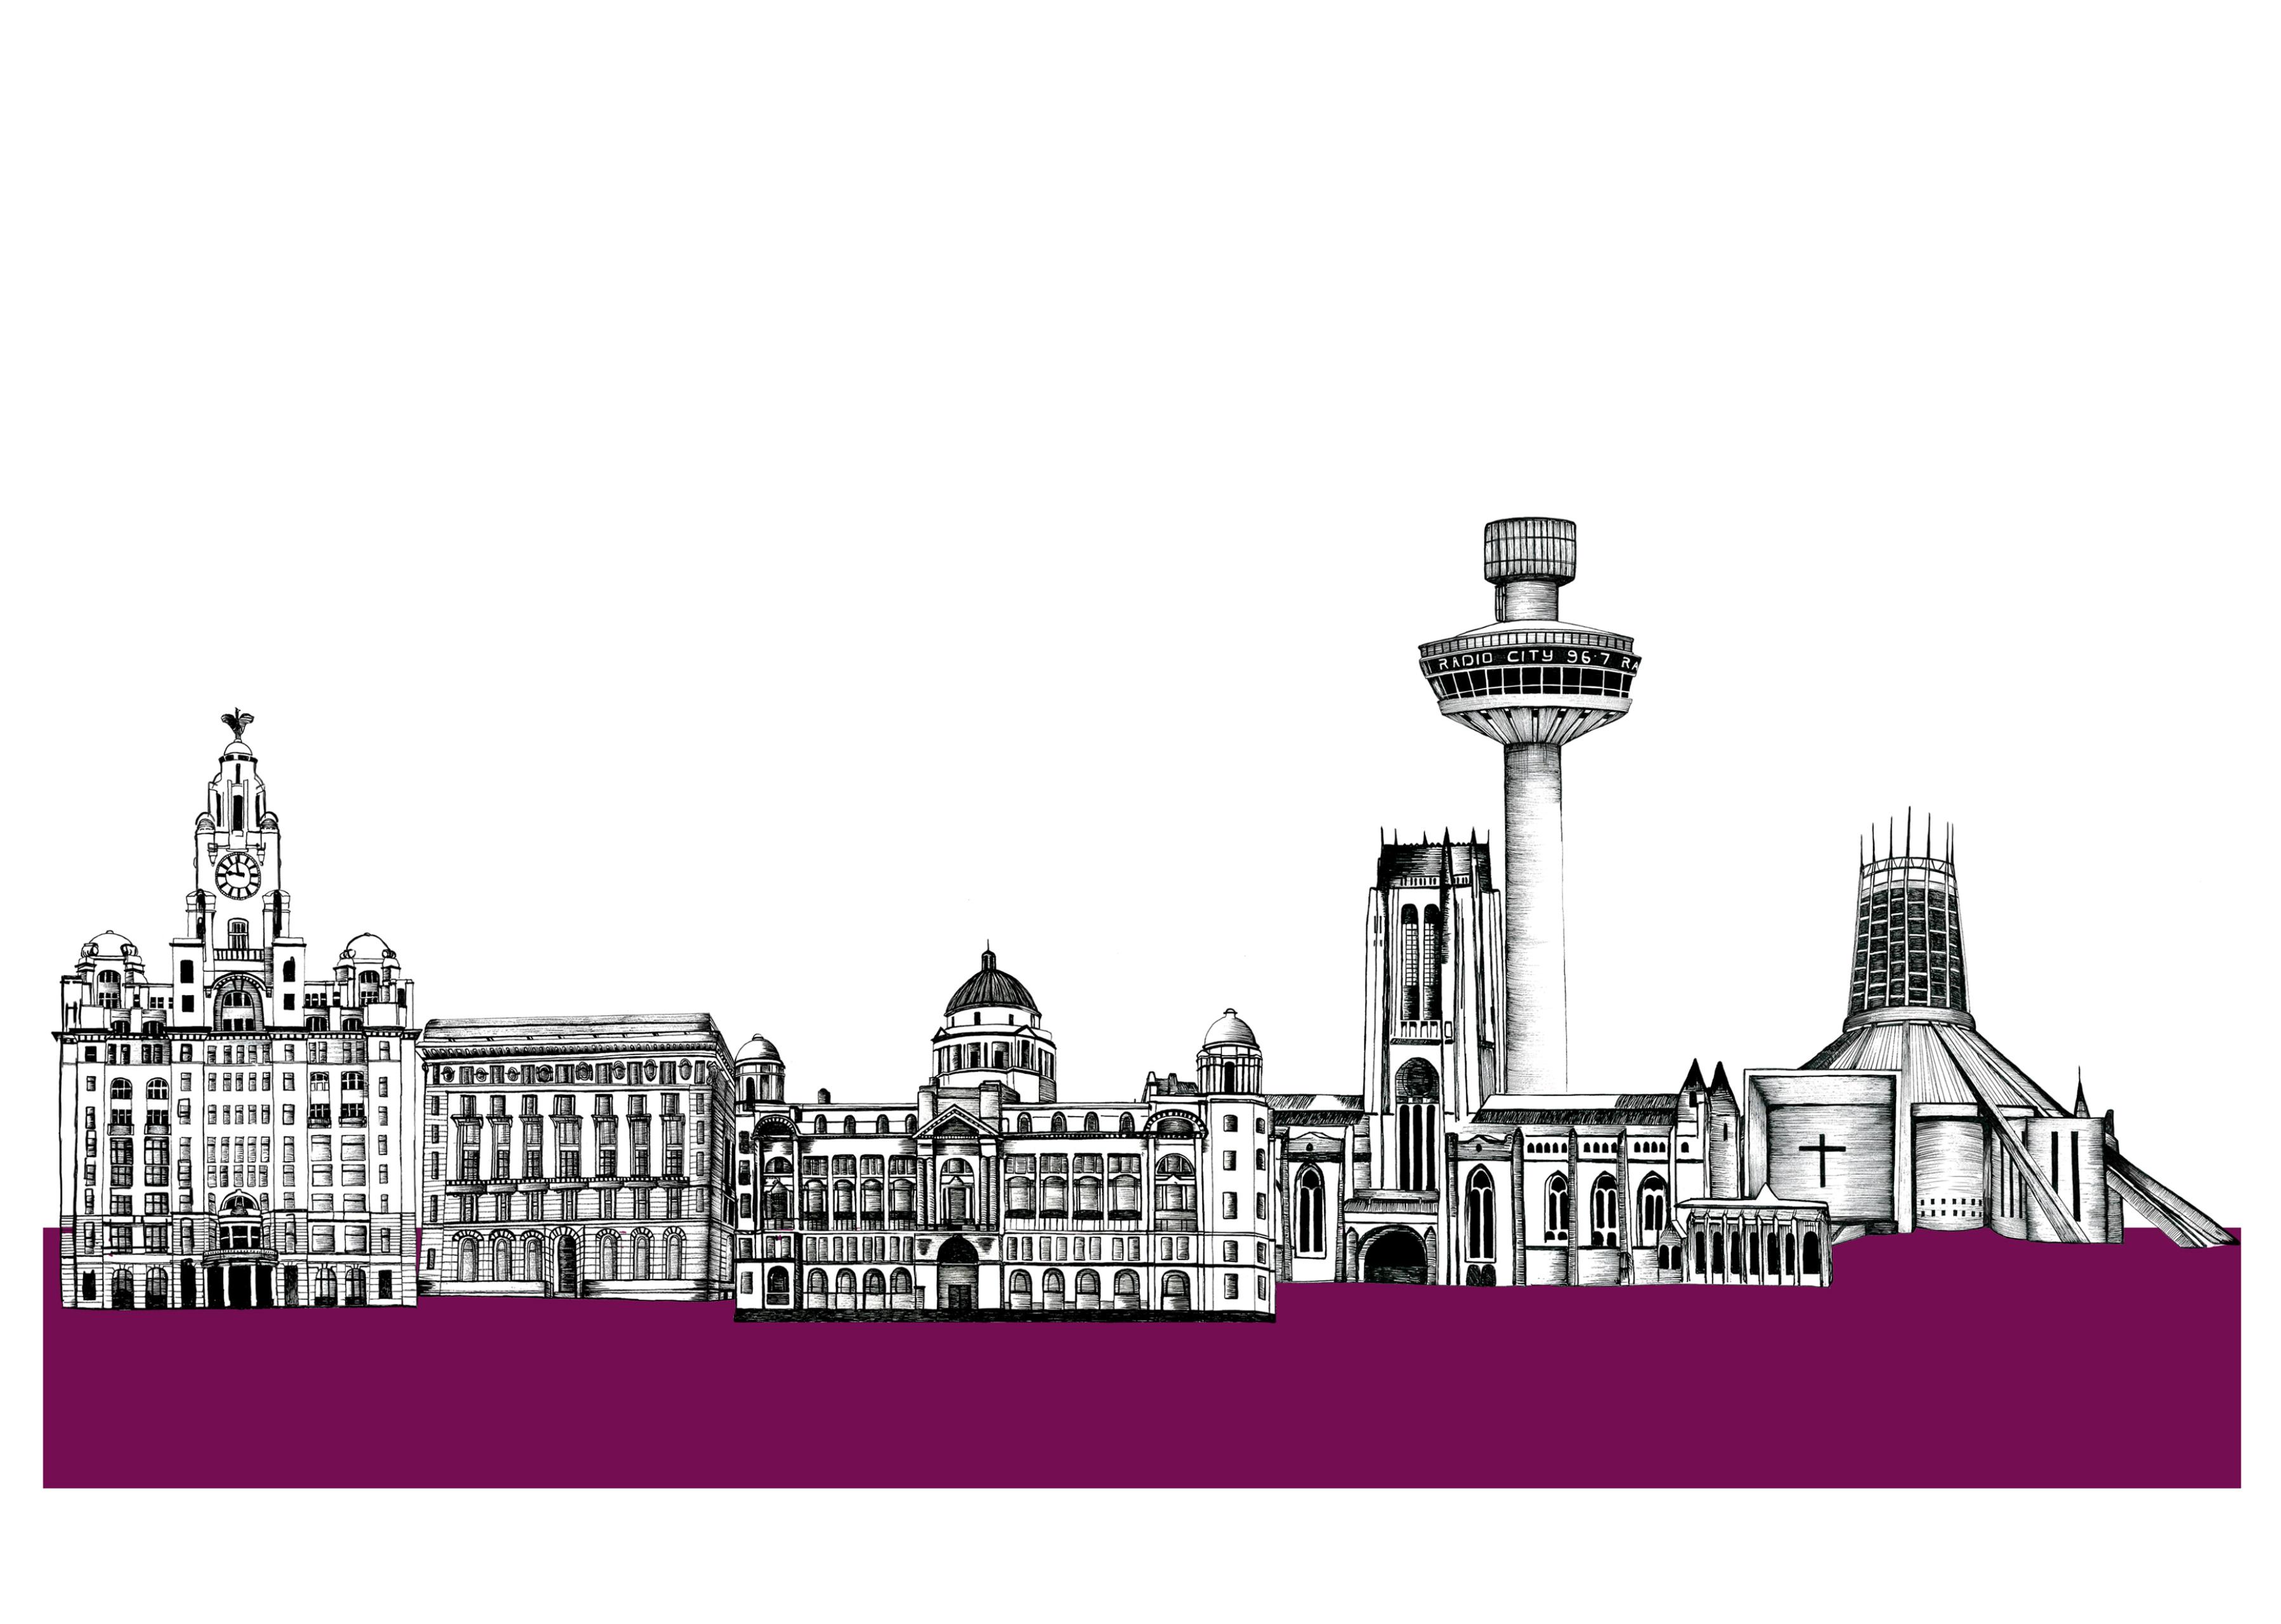 Drawn skyline liverpool Liverpool City Google Skyline and